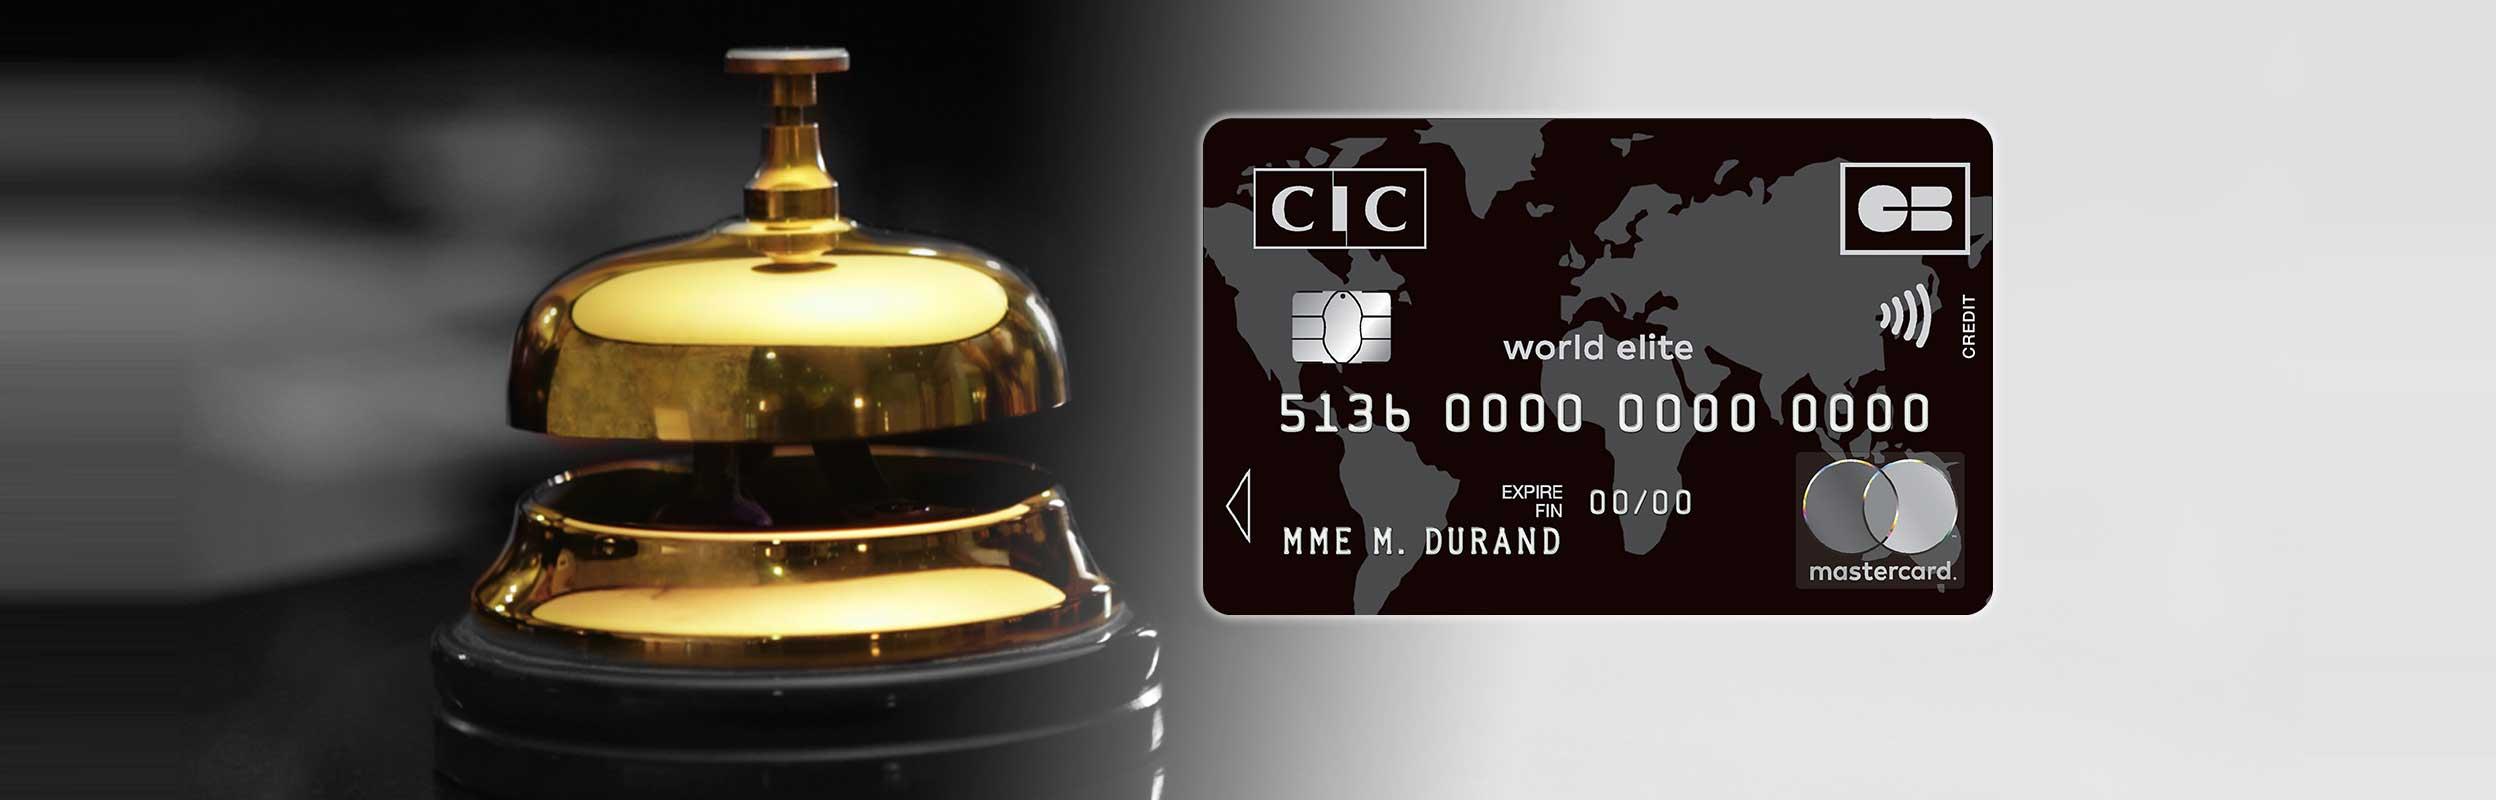 Carte Black Credit Mutuel.Carte World Elite Mastercard Cic